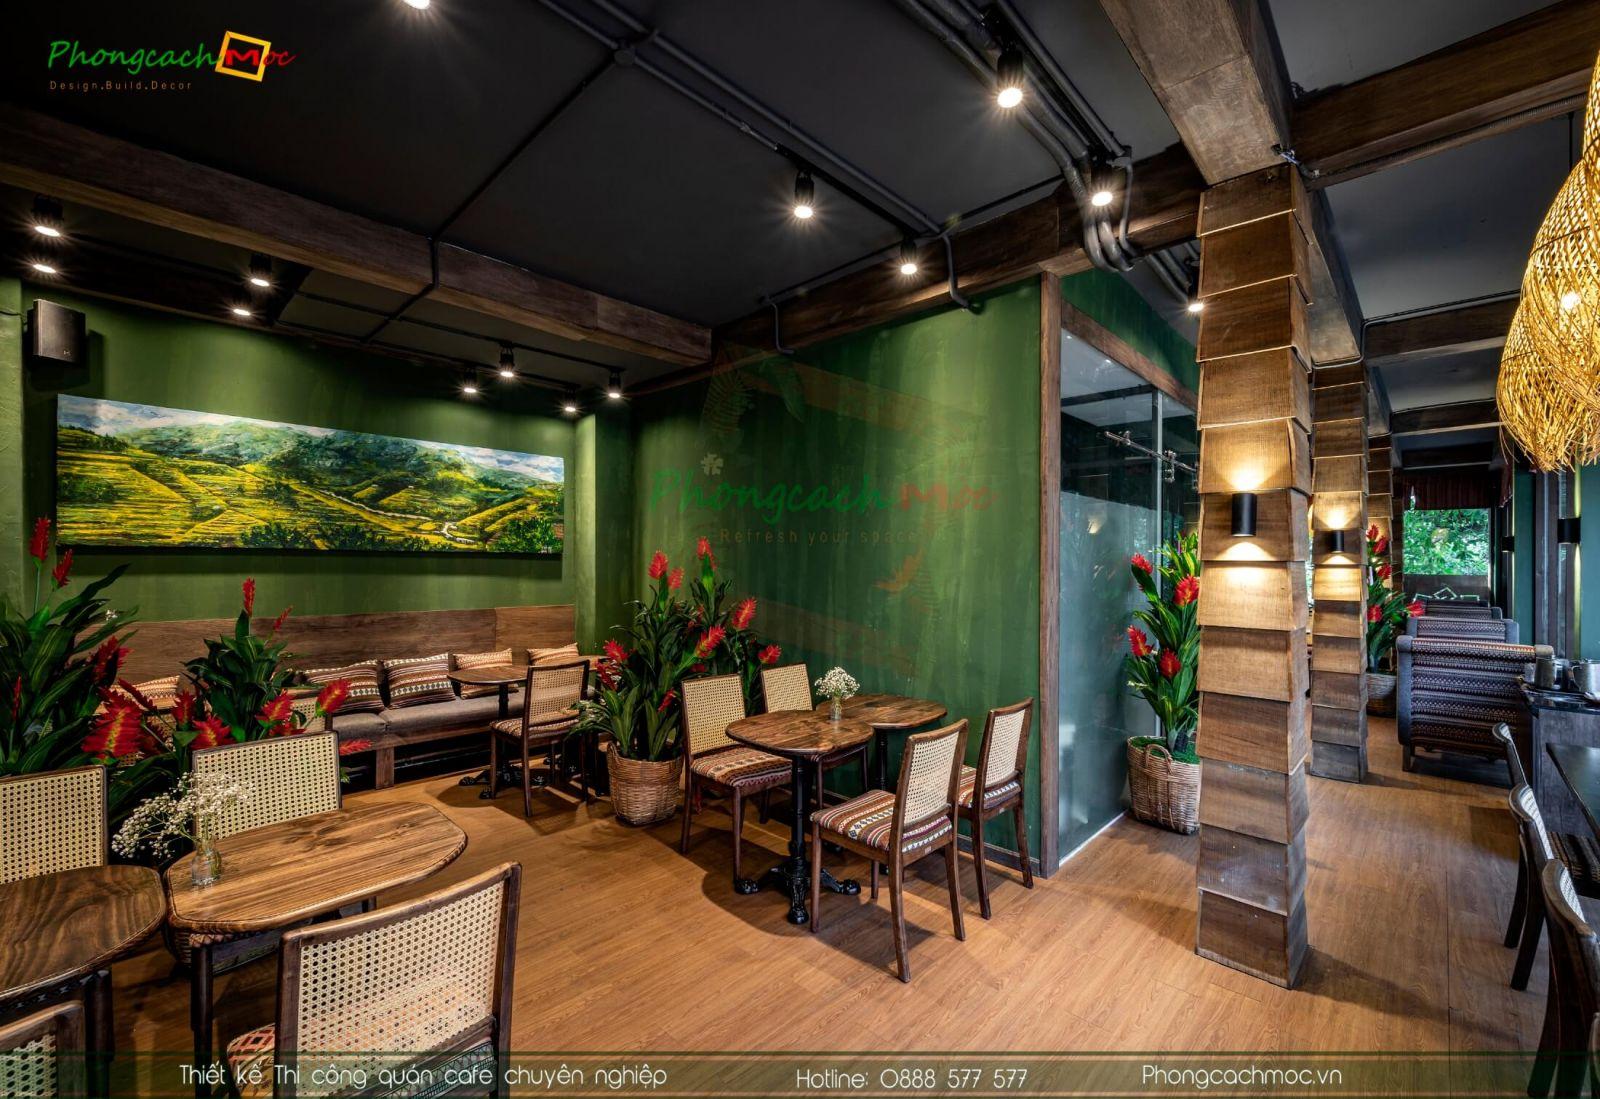 thiet-ke-thi-cong-hoan-thien-quan-cafe-nha-cua-mi25